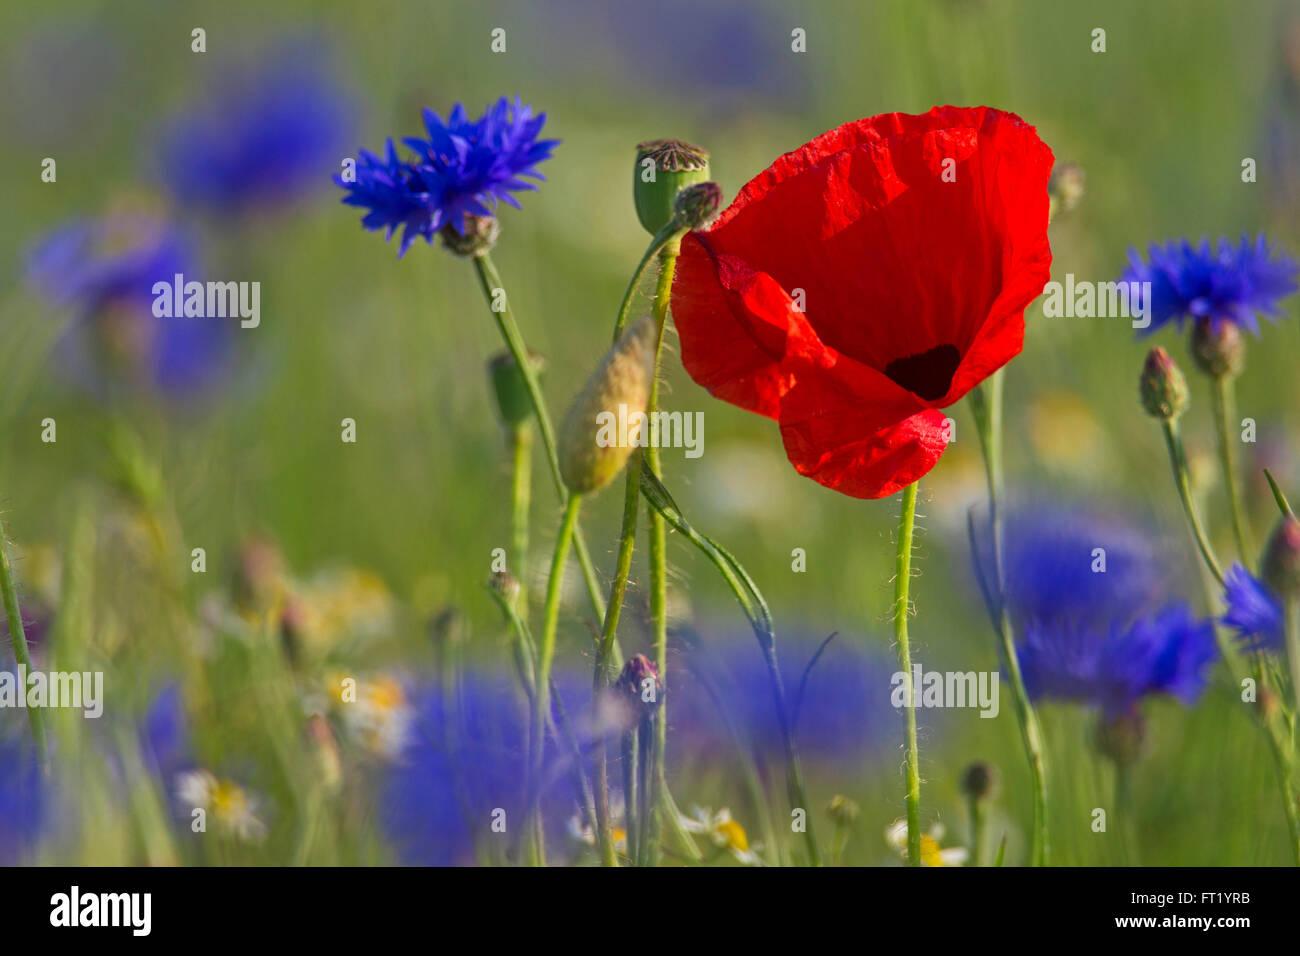 Corn poppy / red poppies (Papaver rhoeas) and cornflowers / bluebottles (Centaurea cyanus) flowering in meadow in summer Stock Photo